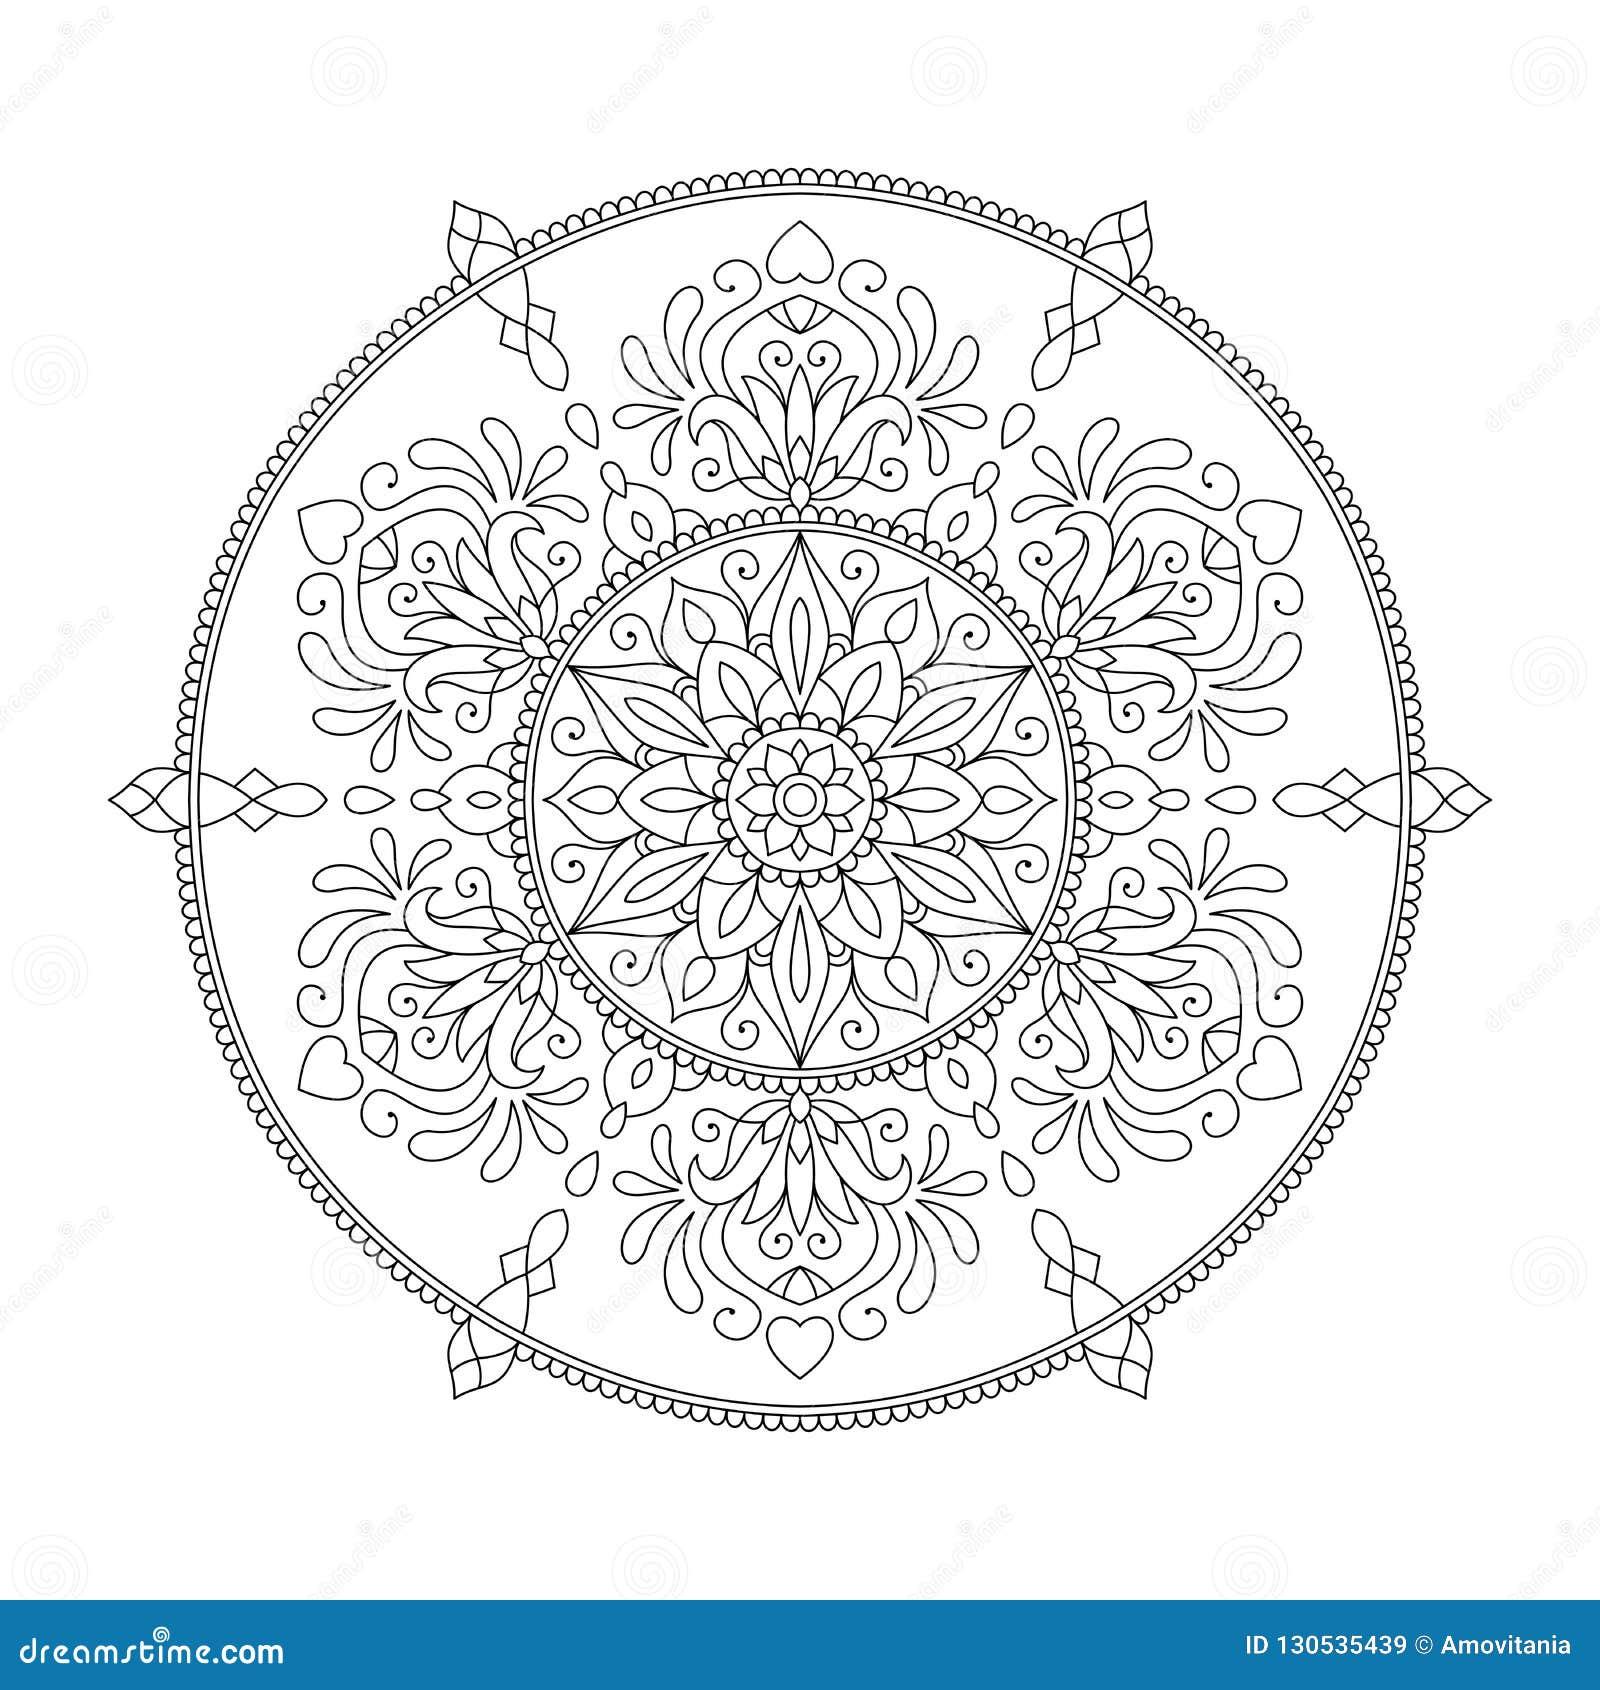 Mandala Coloring Page Flower Design Element For Adult Color ...